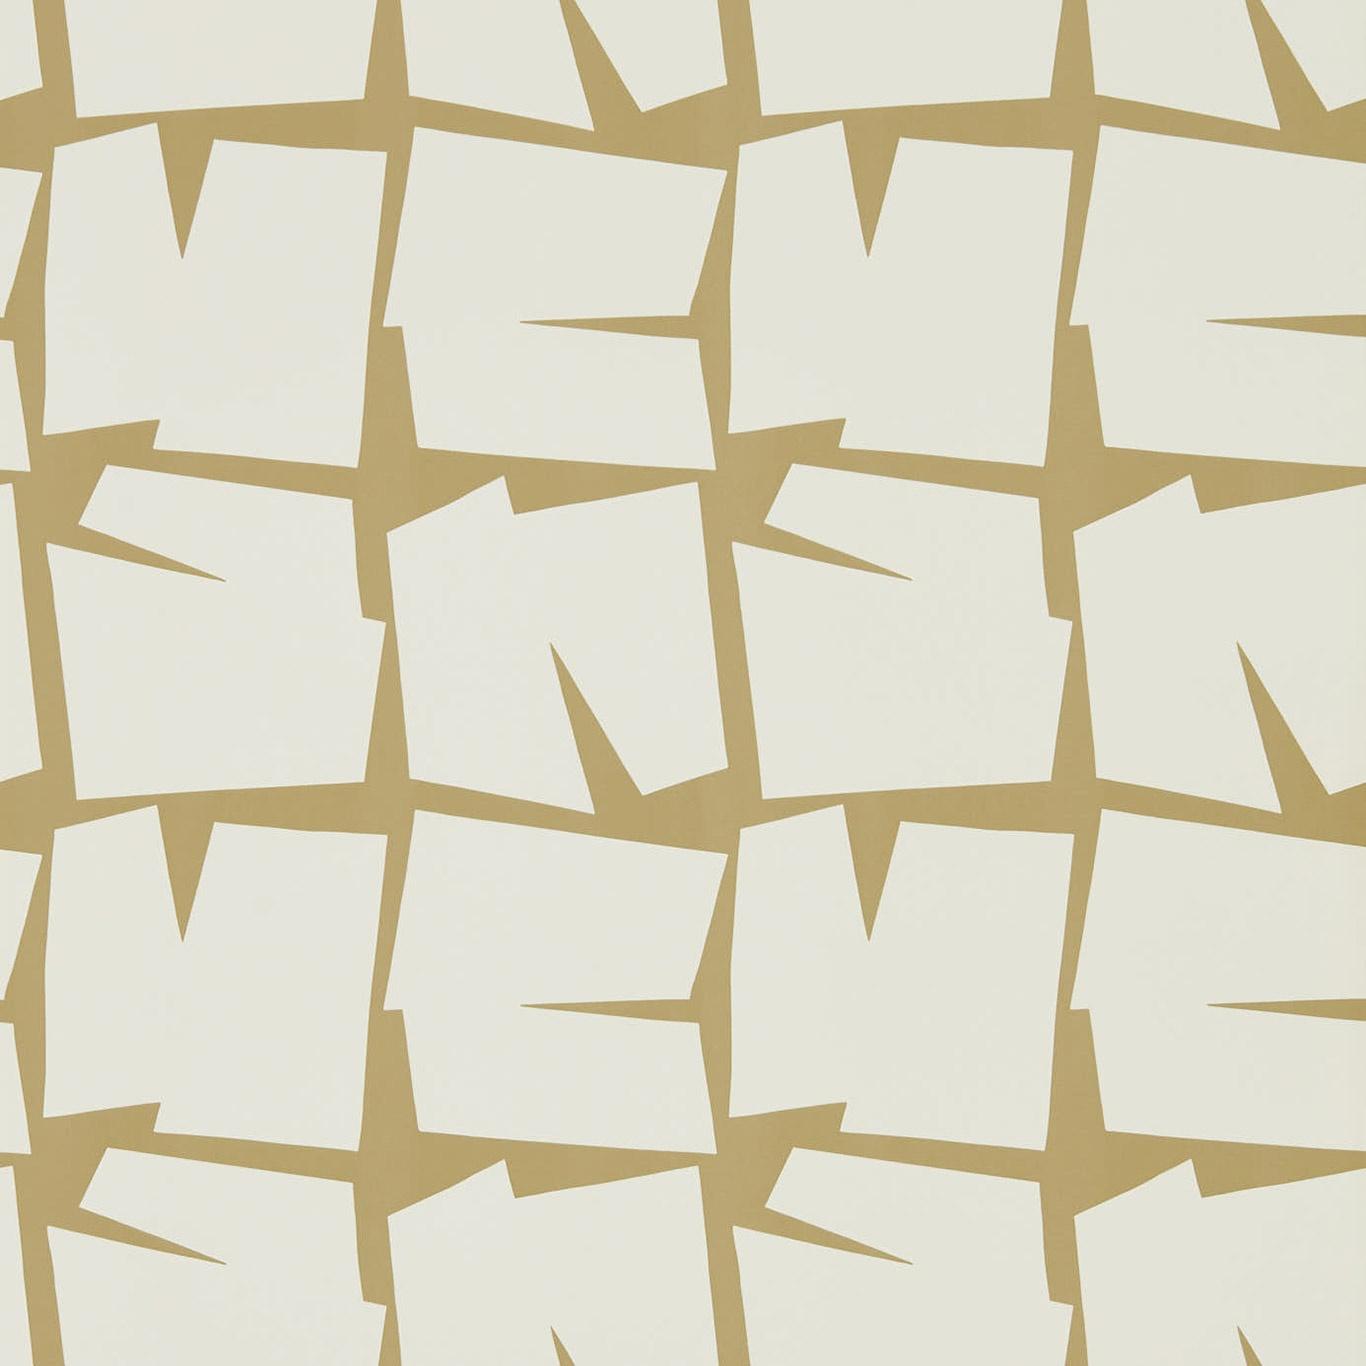 Image of Scion Moqui Caramel Wallpaper 111805